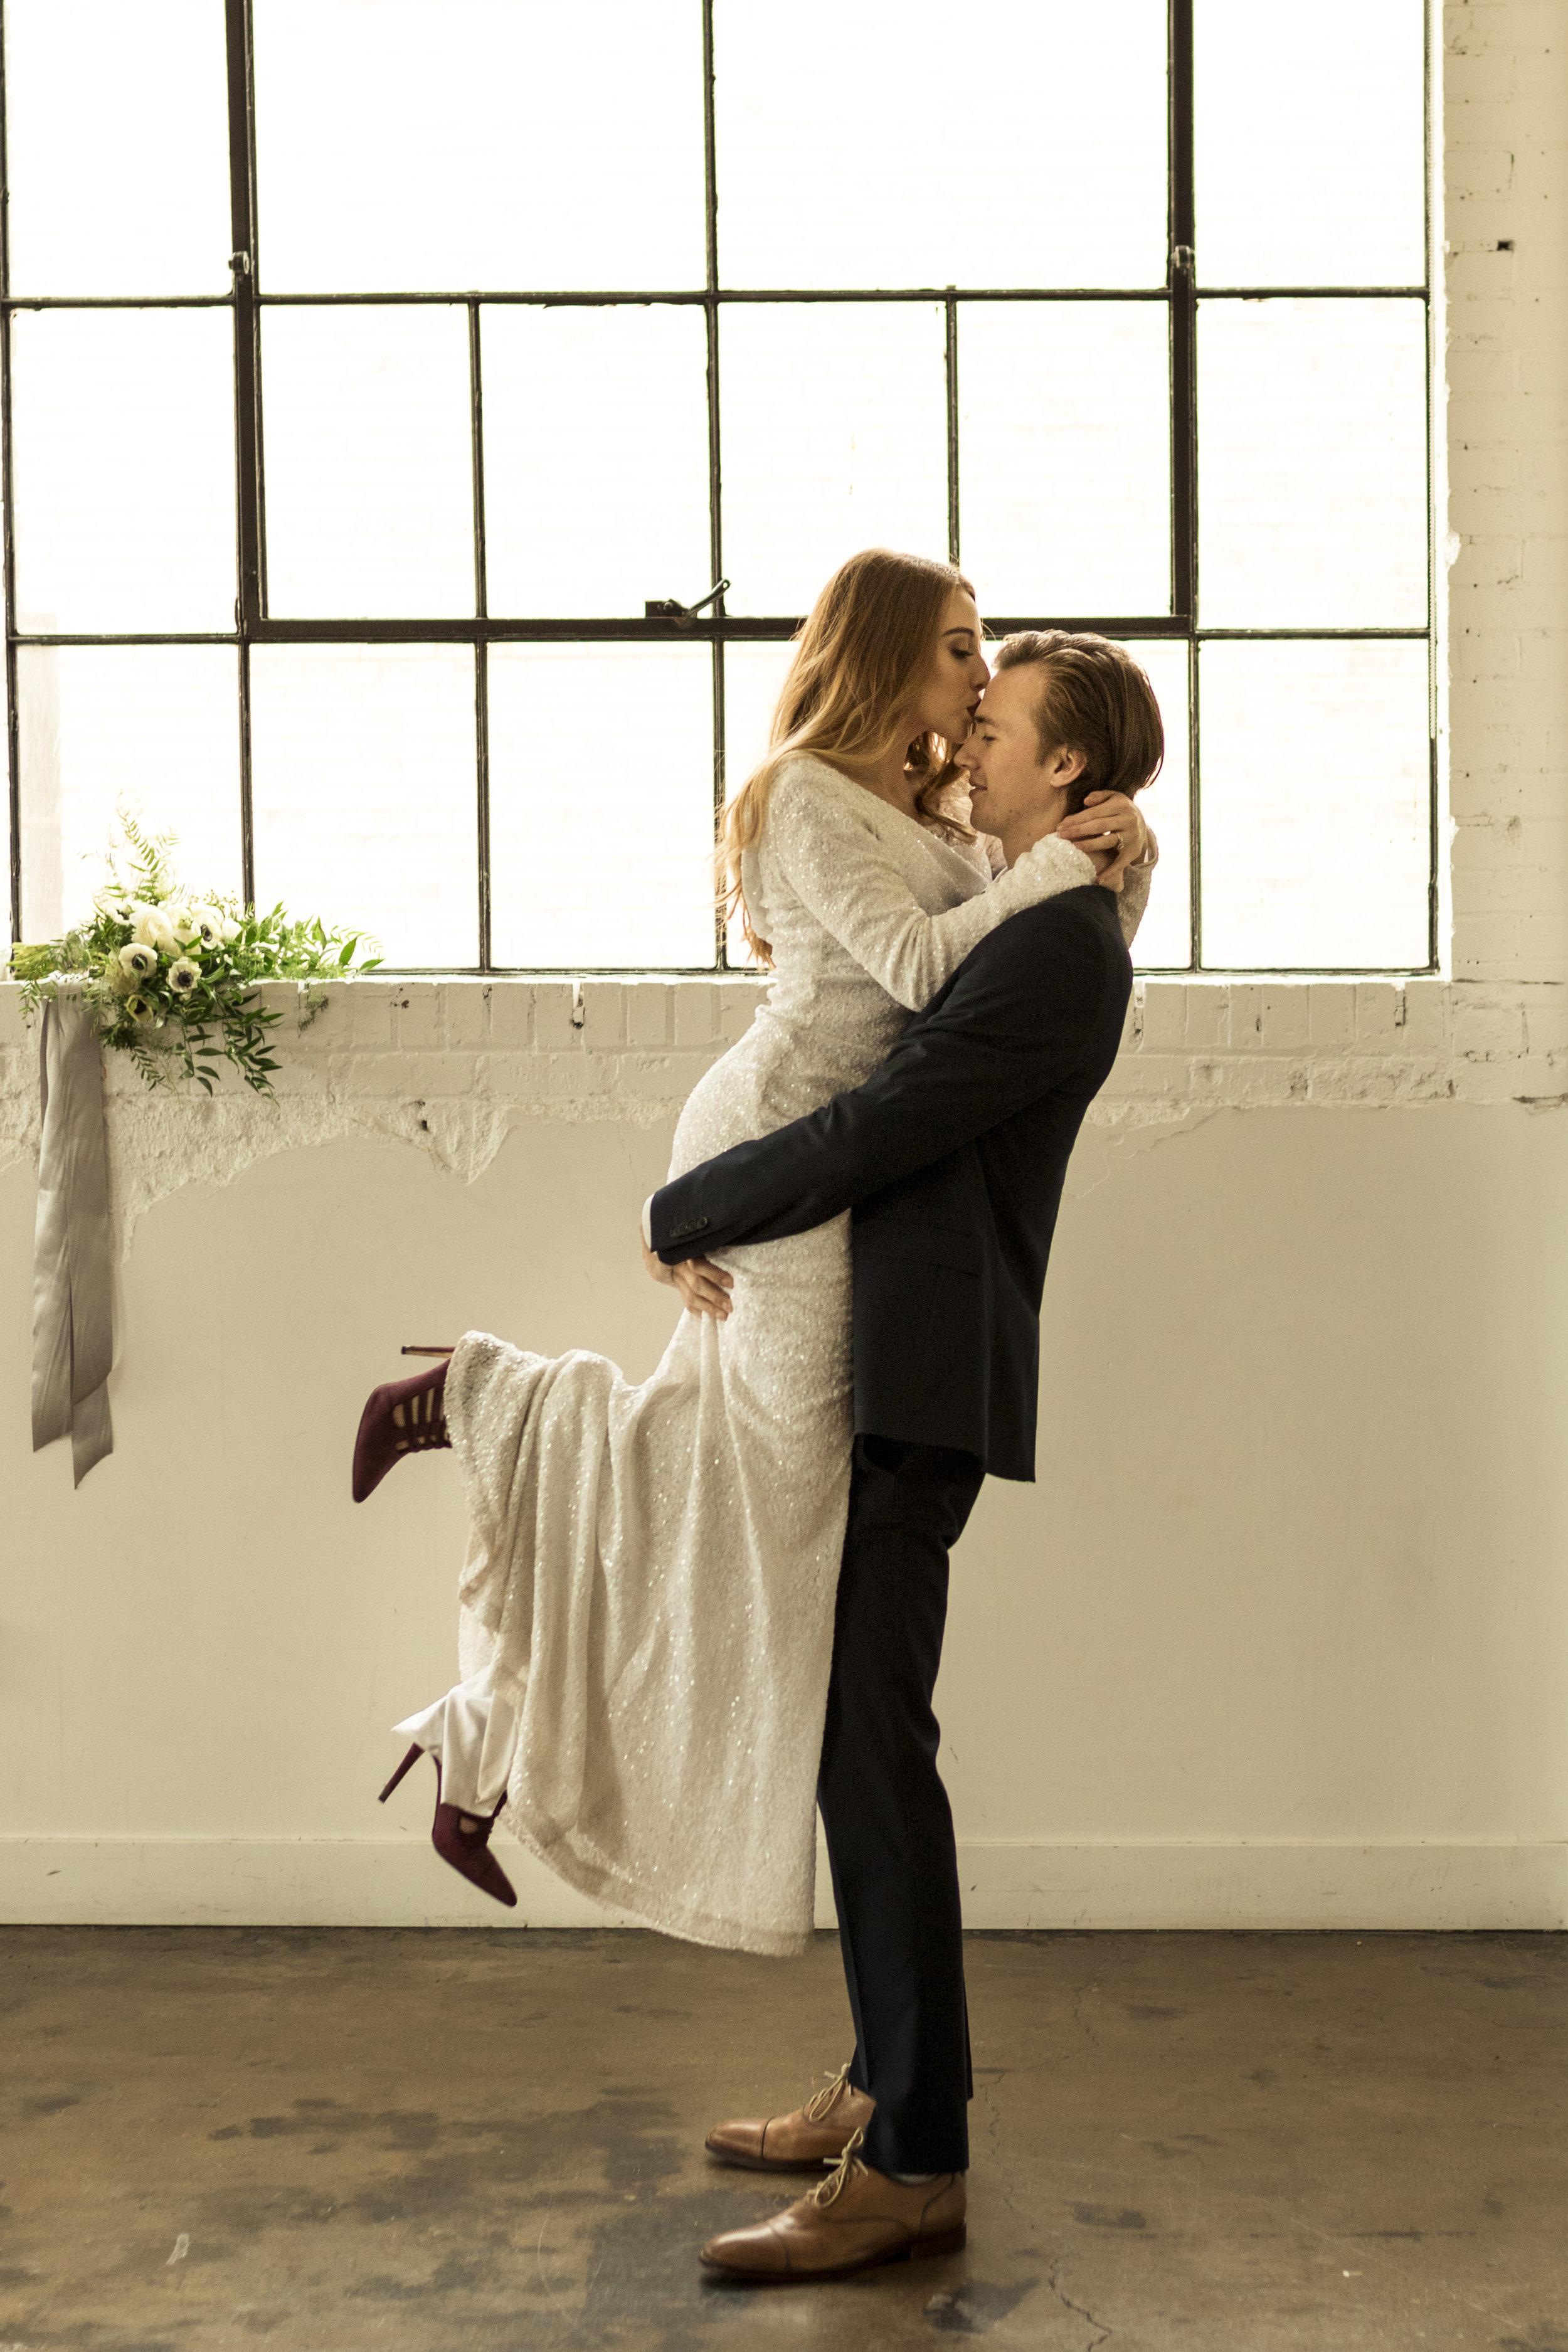 BBPhotodowntown Salt Lake CityUtah Wedding09.JPG